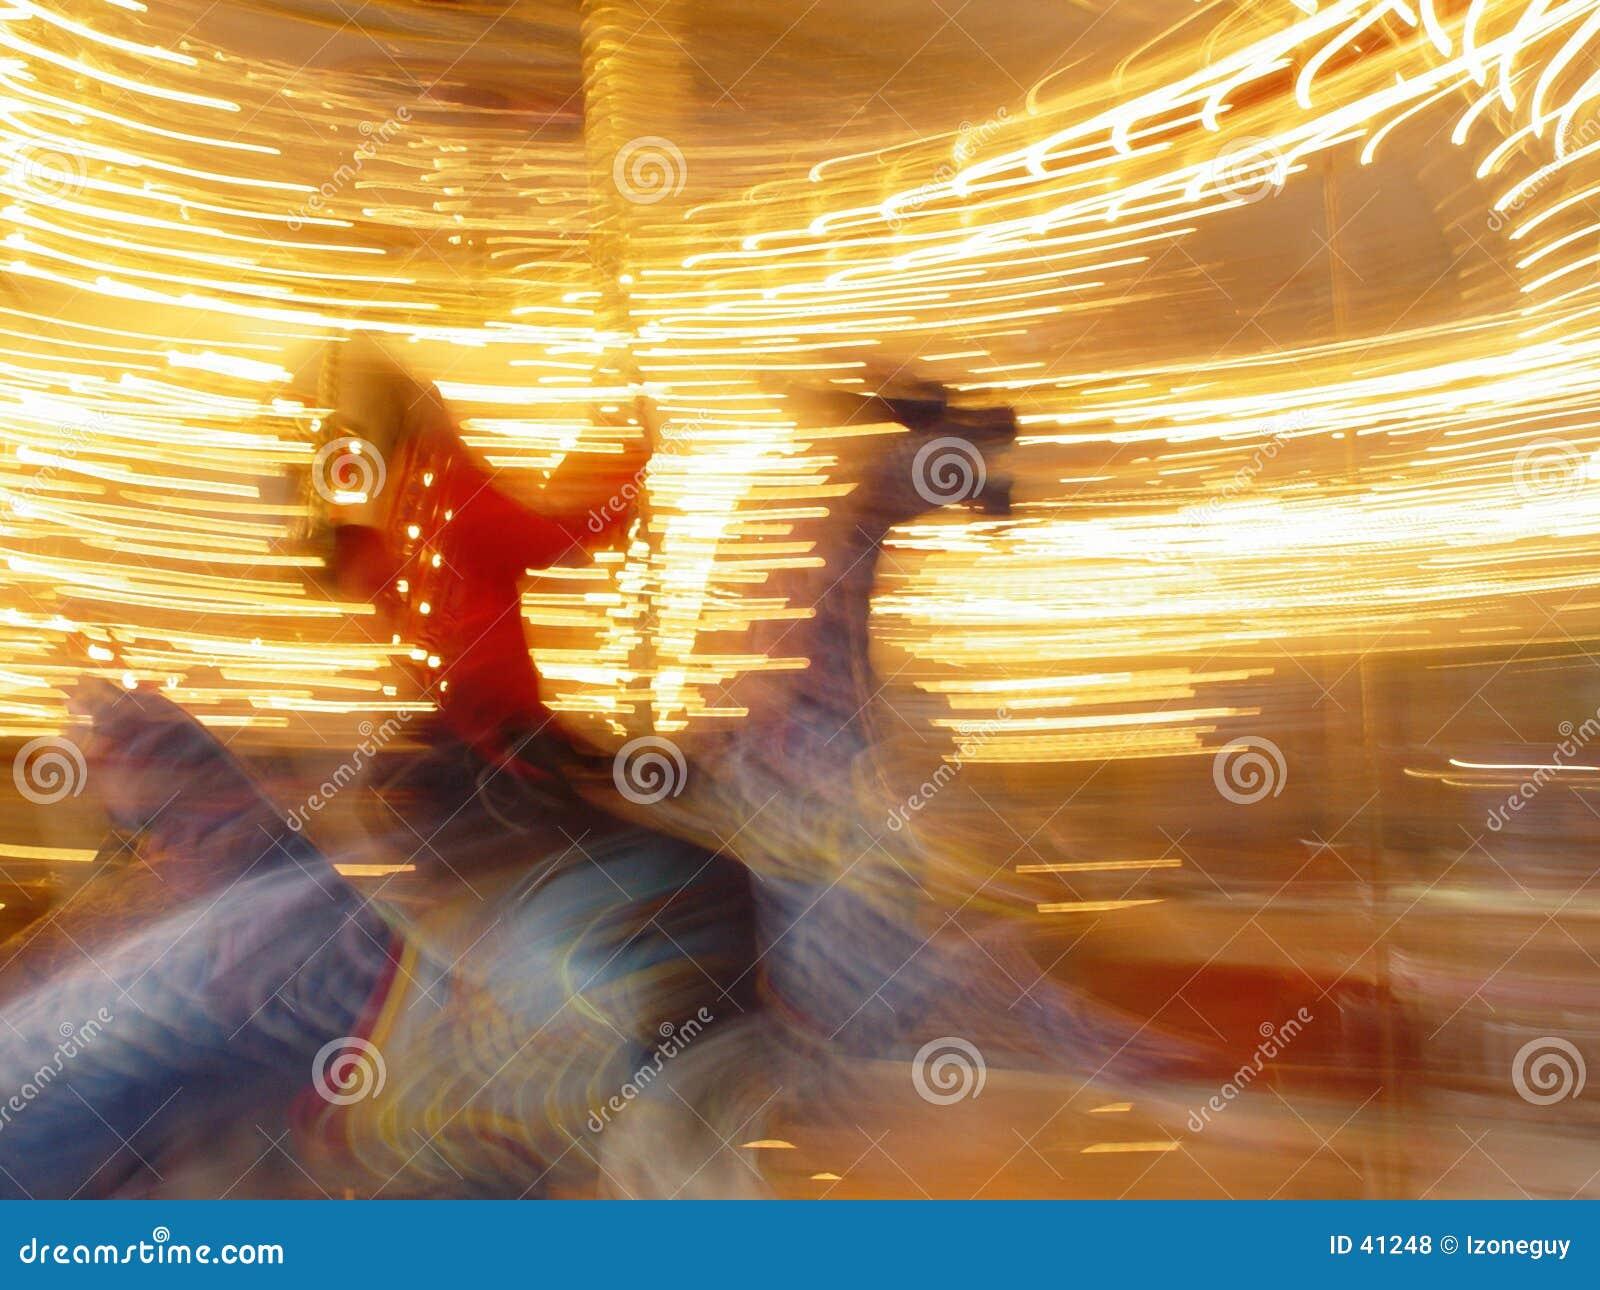 Riding carousel